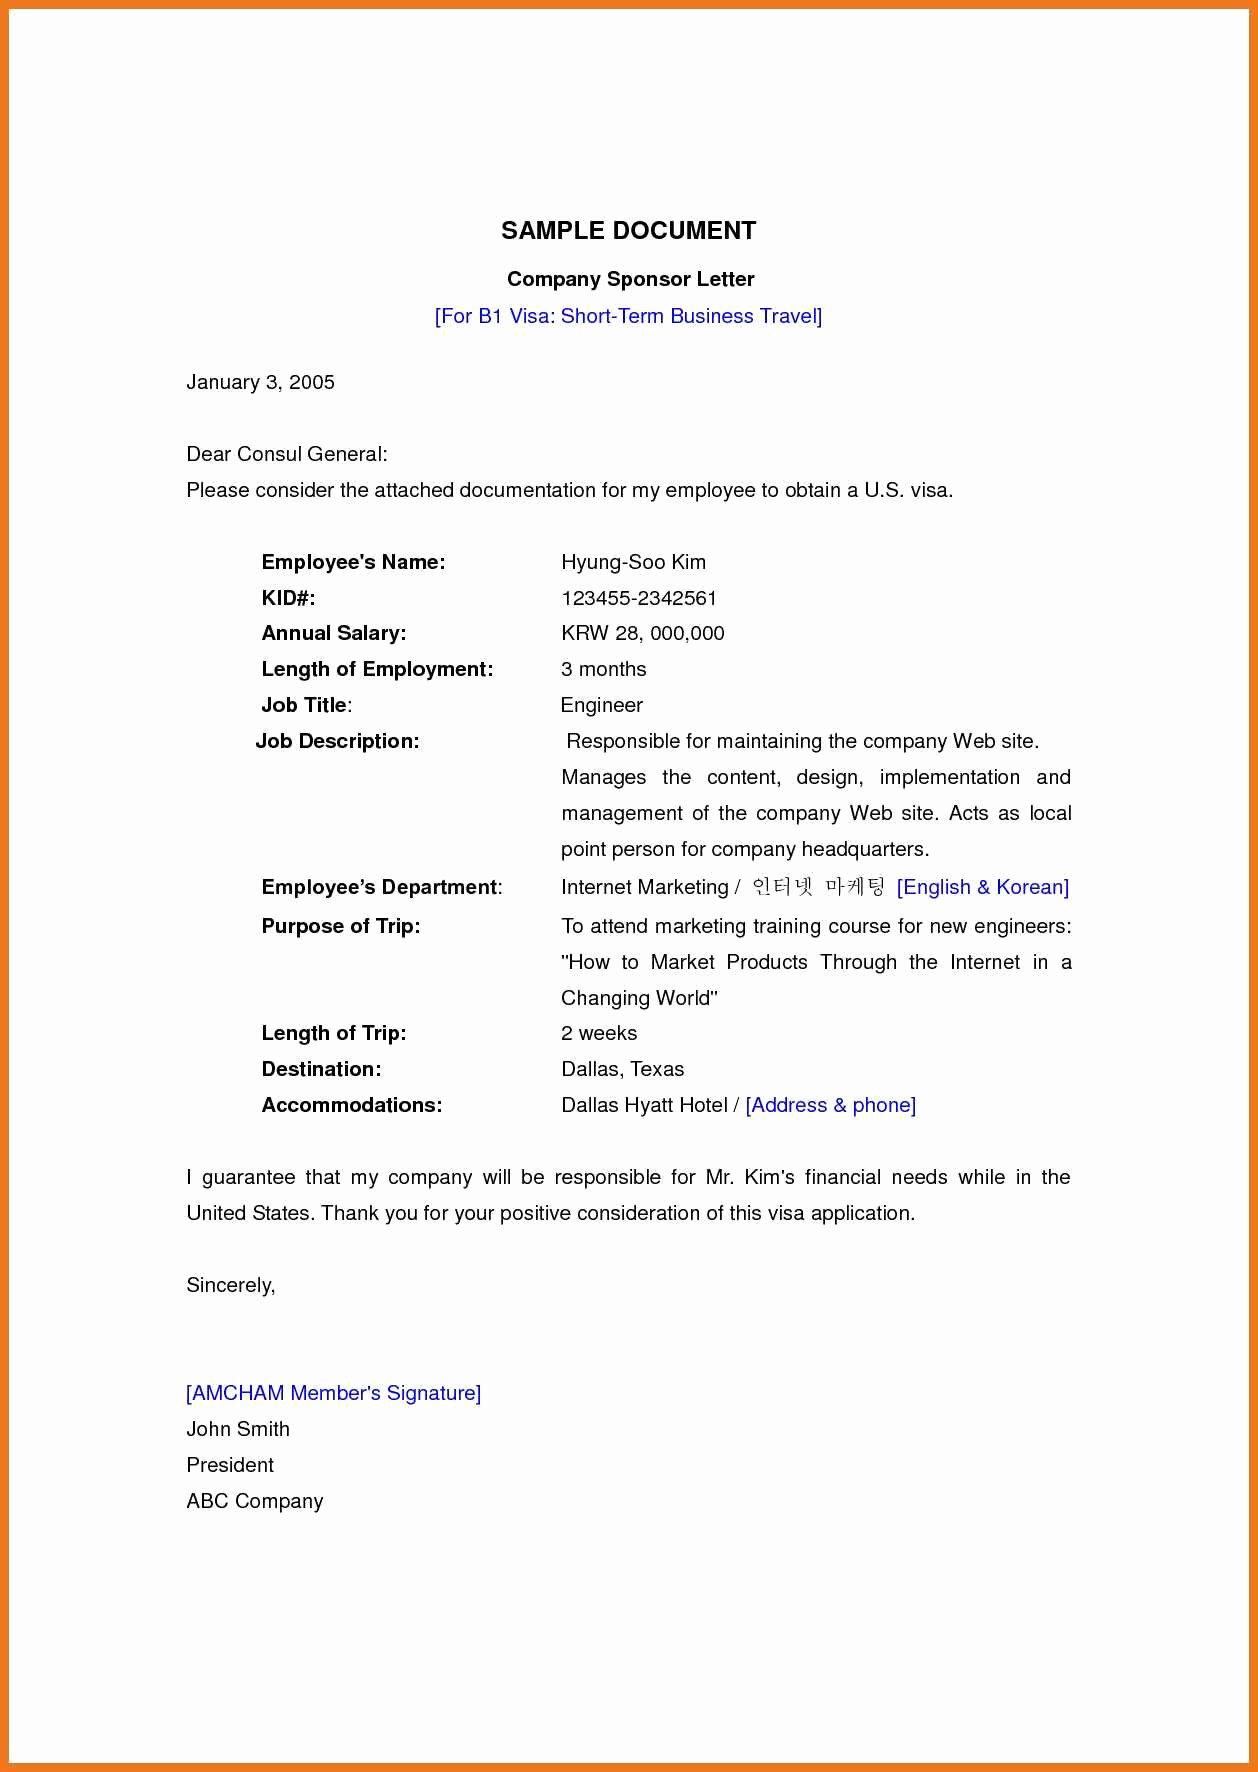 Sponsorship Letter for Visa Unique 9 10 Sponsorship Letter for Us Visa